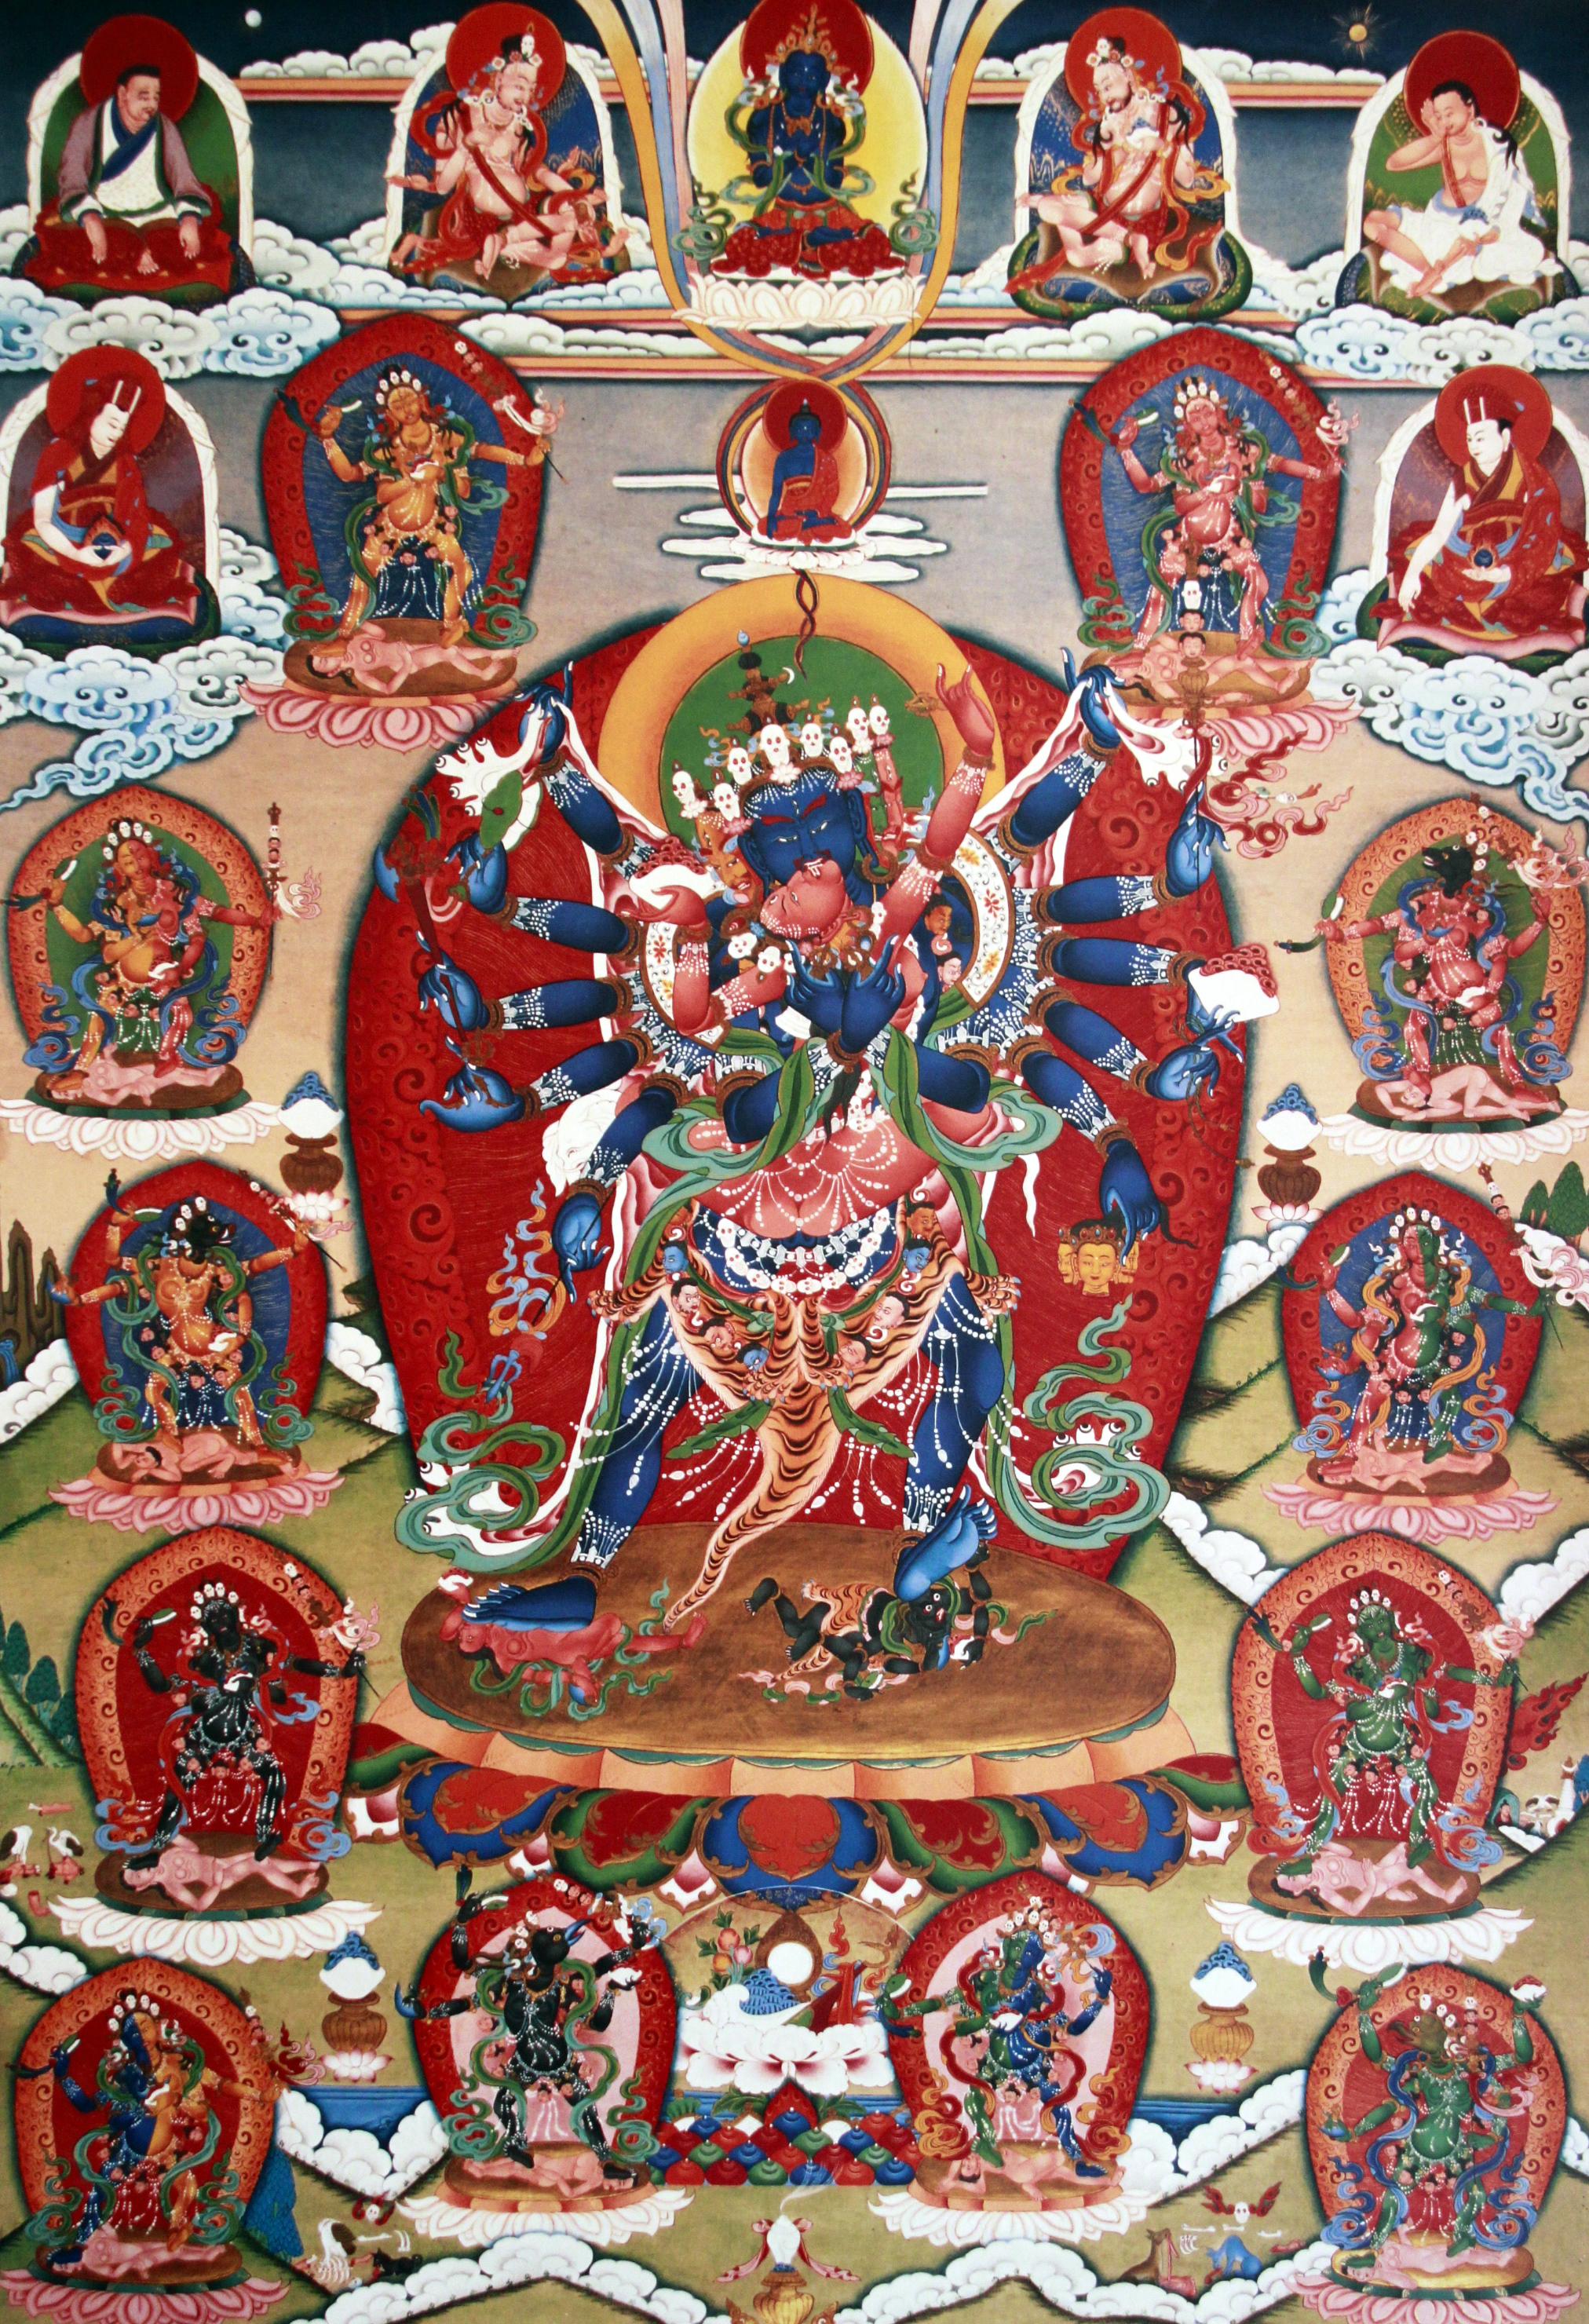 Dechen Choekhor's Twelve-armed Chakrasamvara thangka